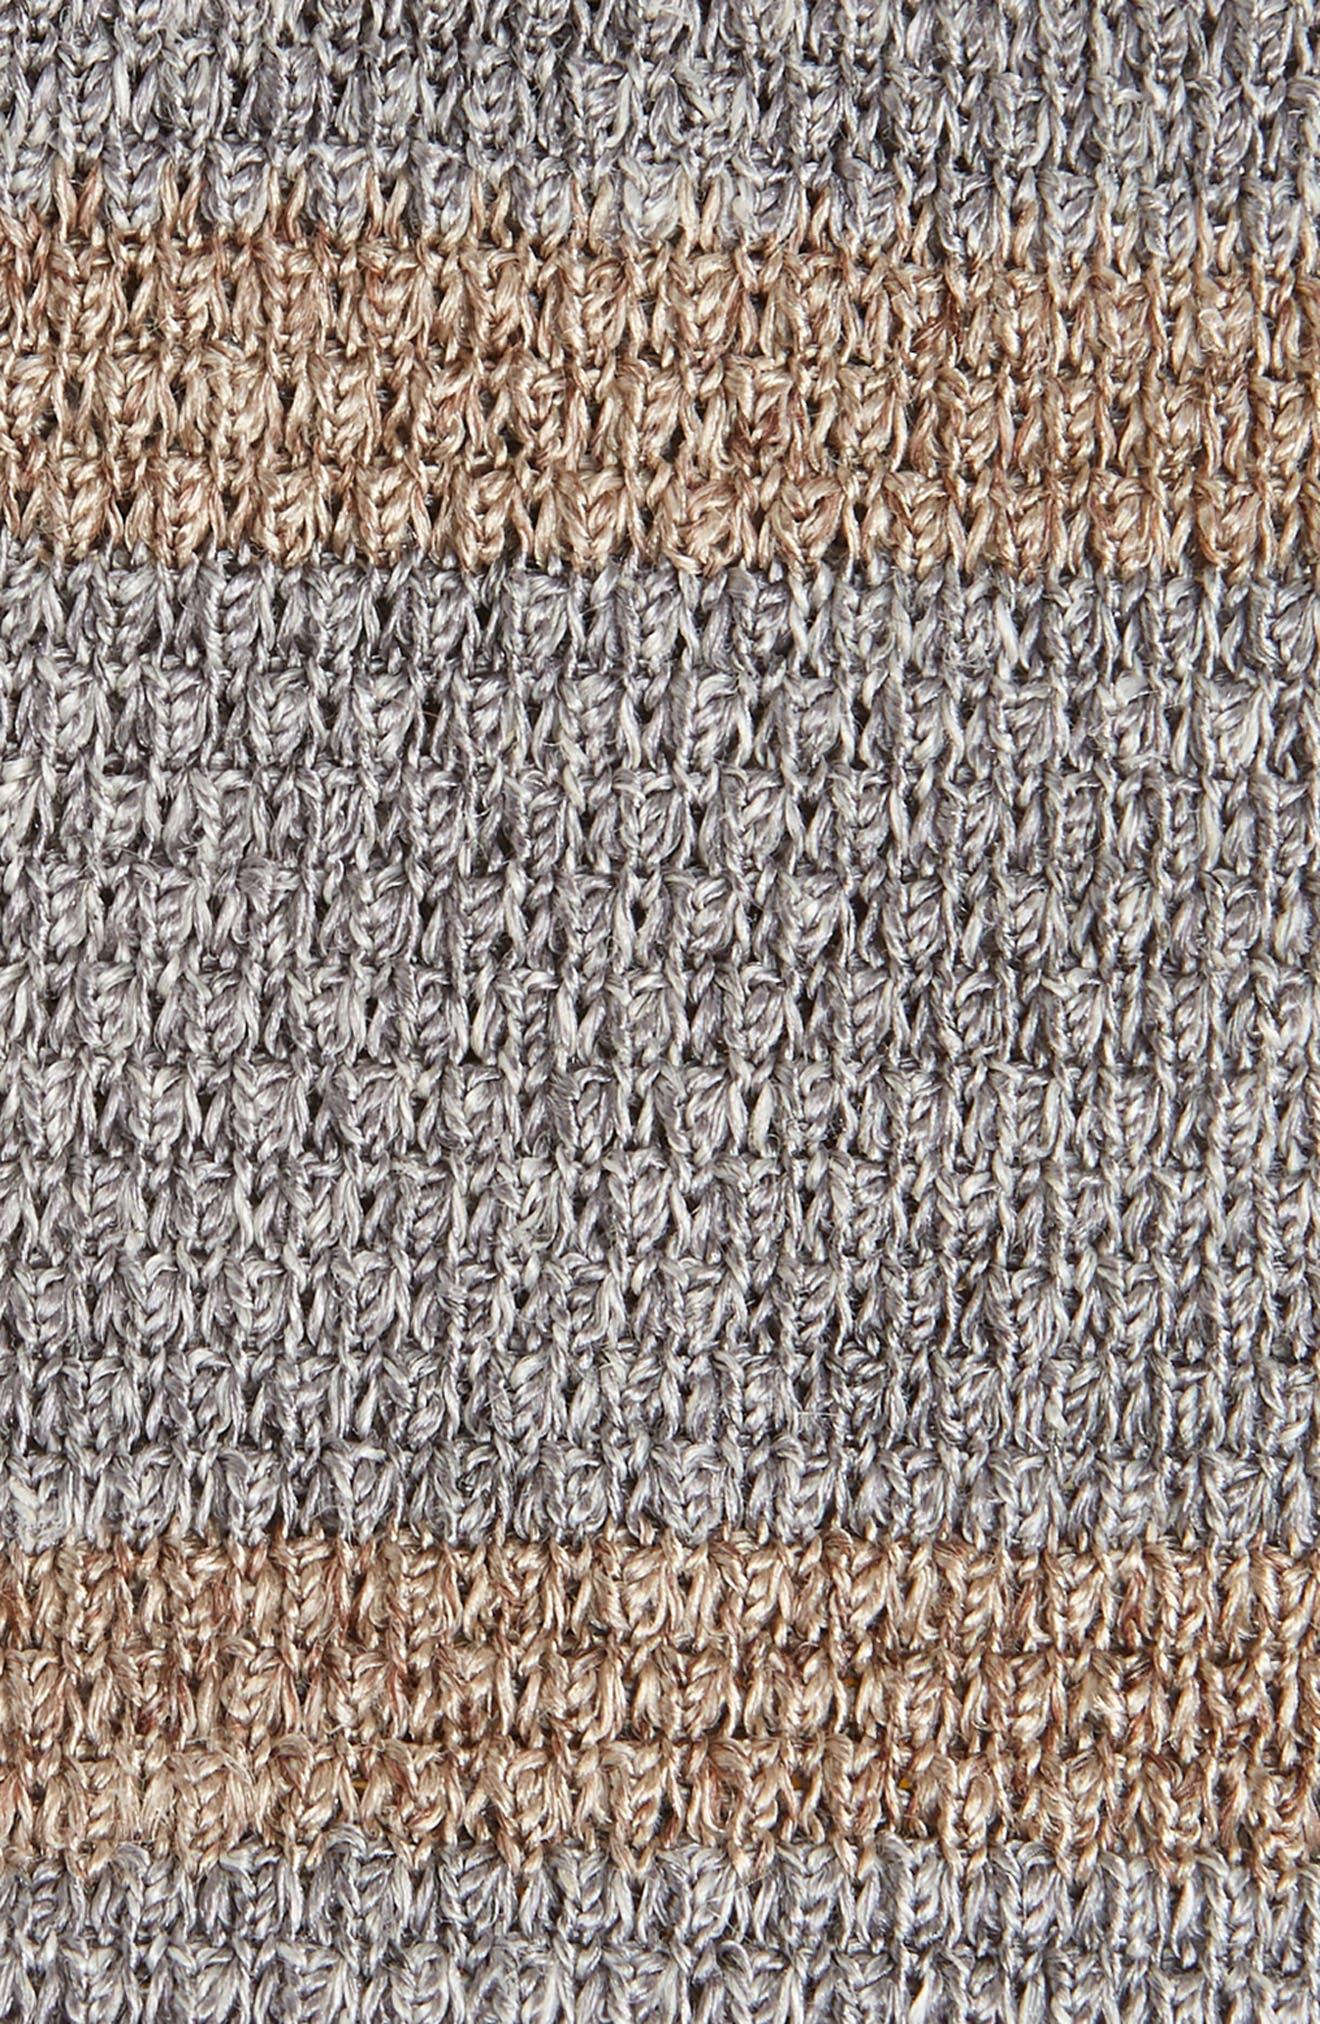 Stripe Skinny Woven Silk & Linen Tie,                             Alternate thumbnail 2, color,                             020